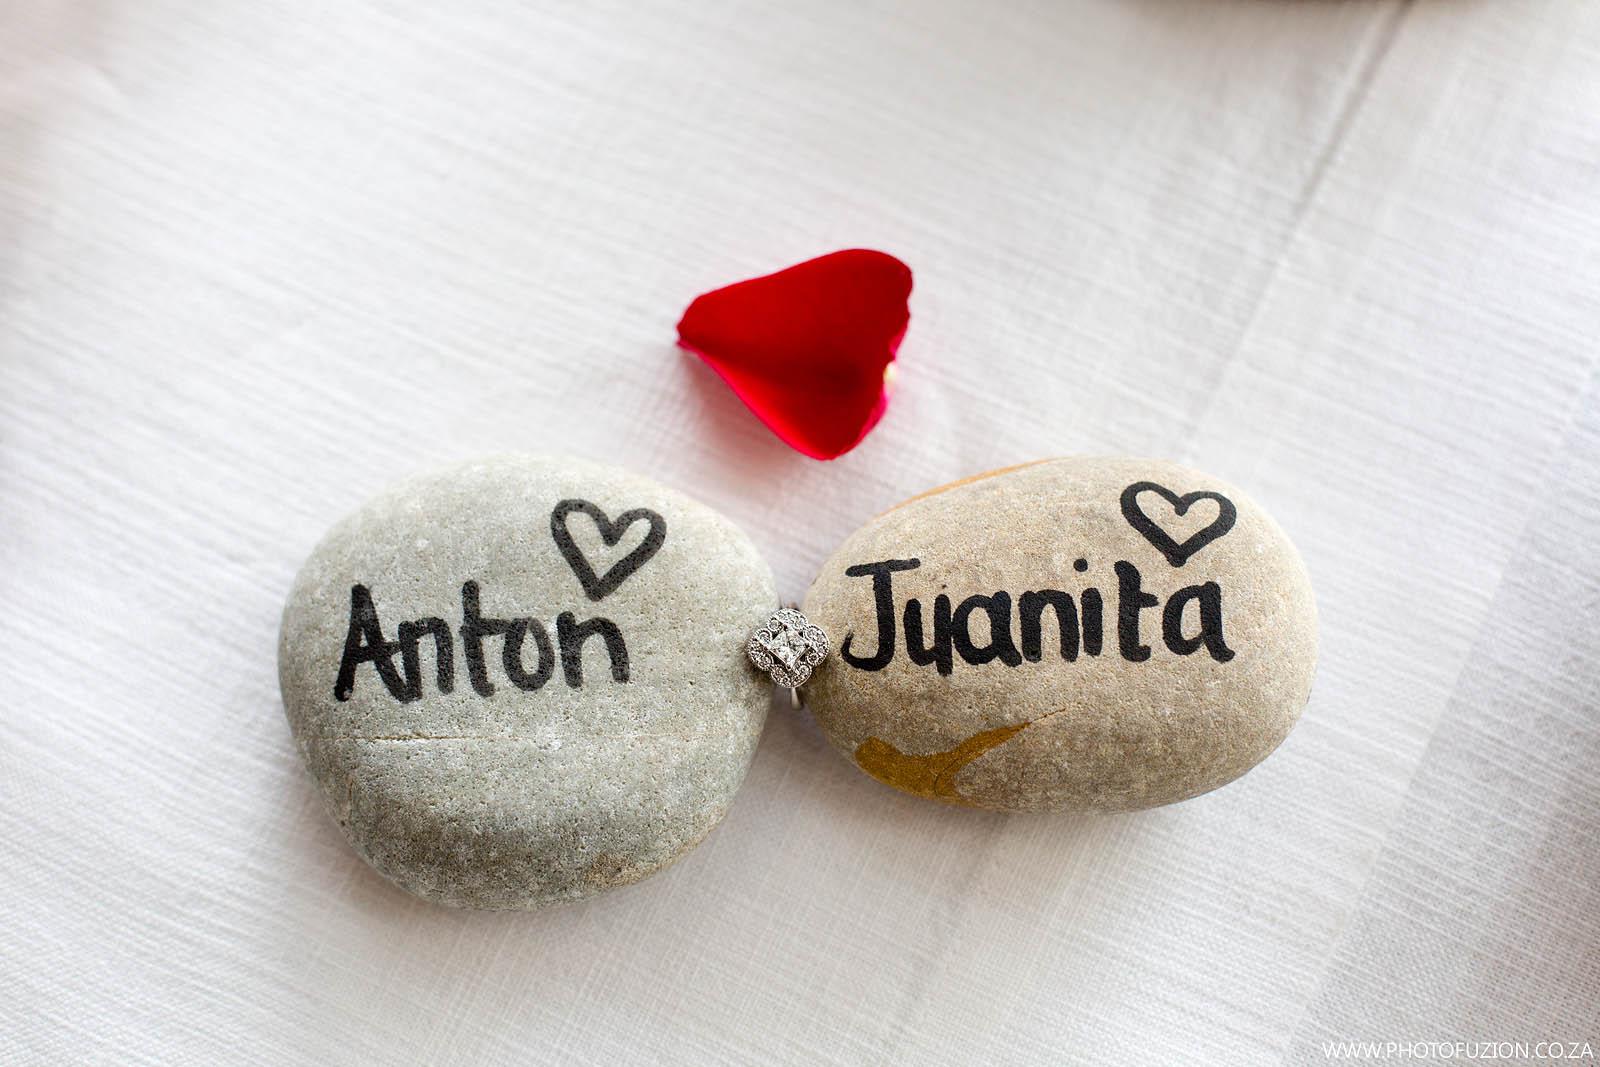 Anton and Juanita marriage proposal at Tinswalo